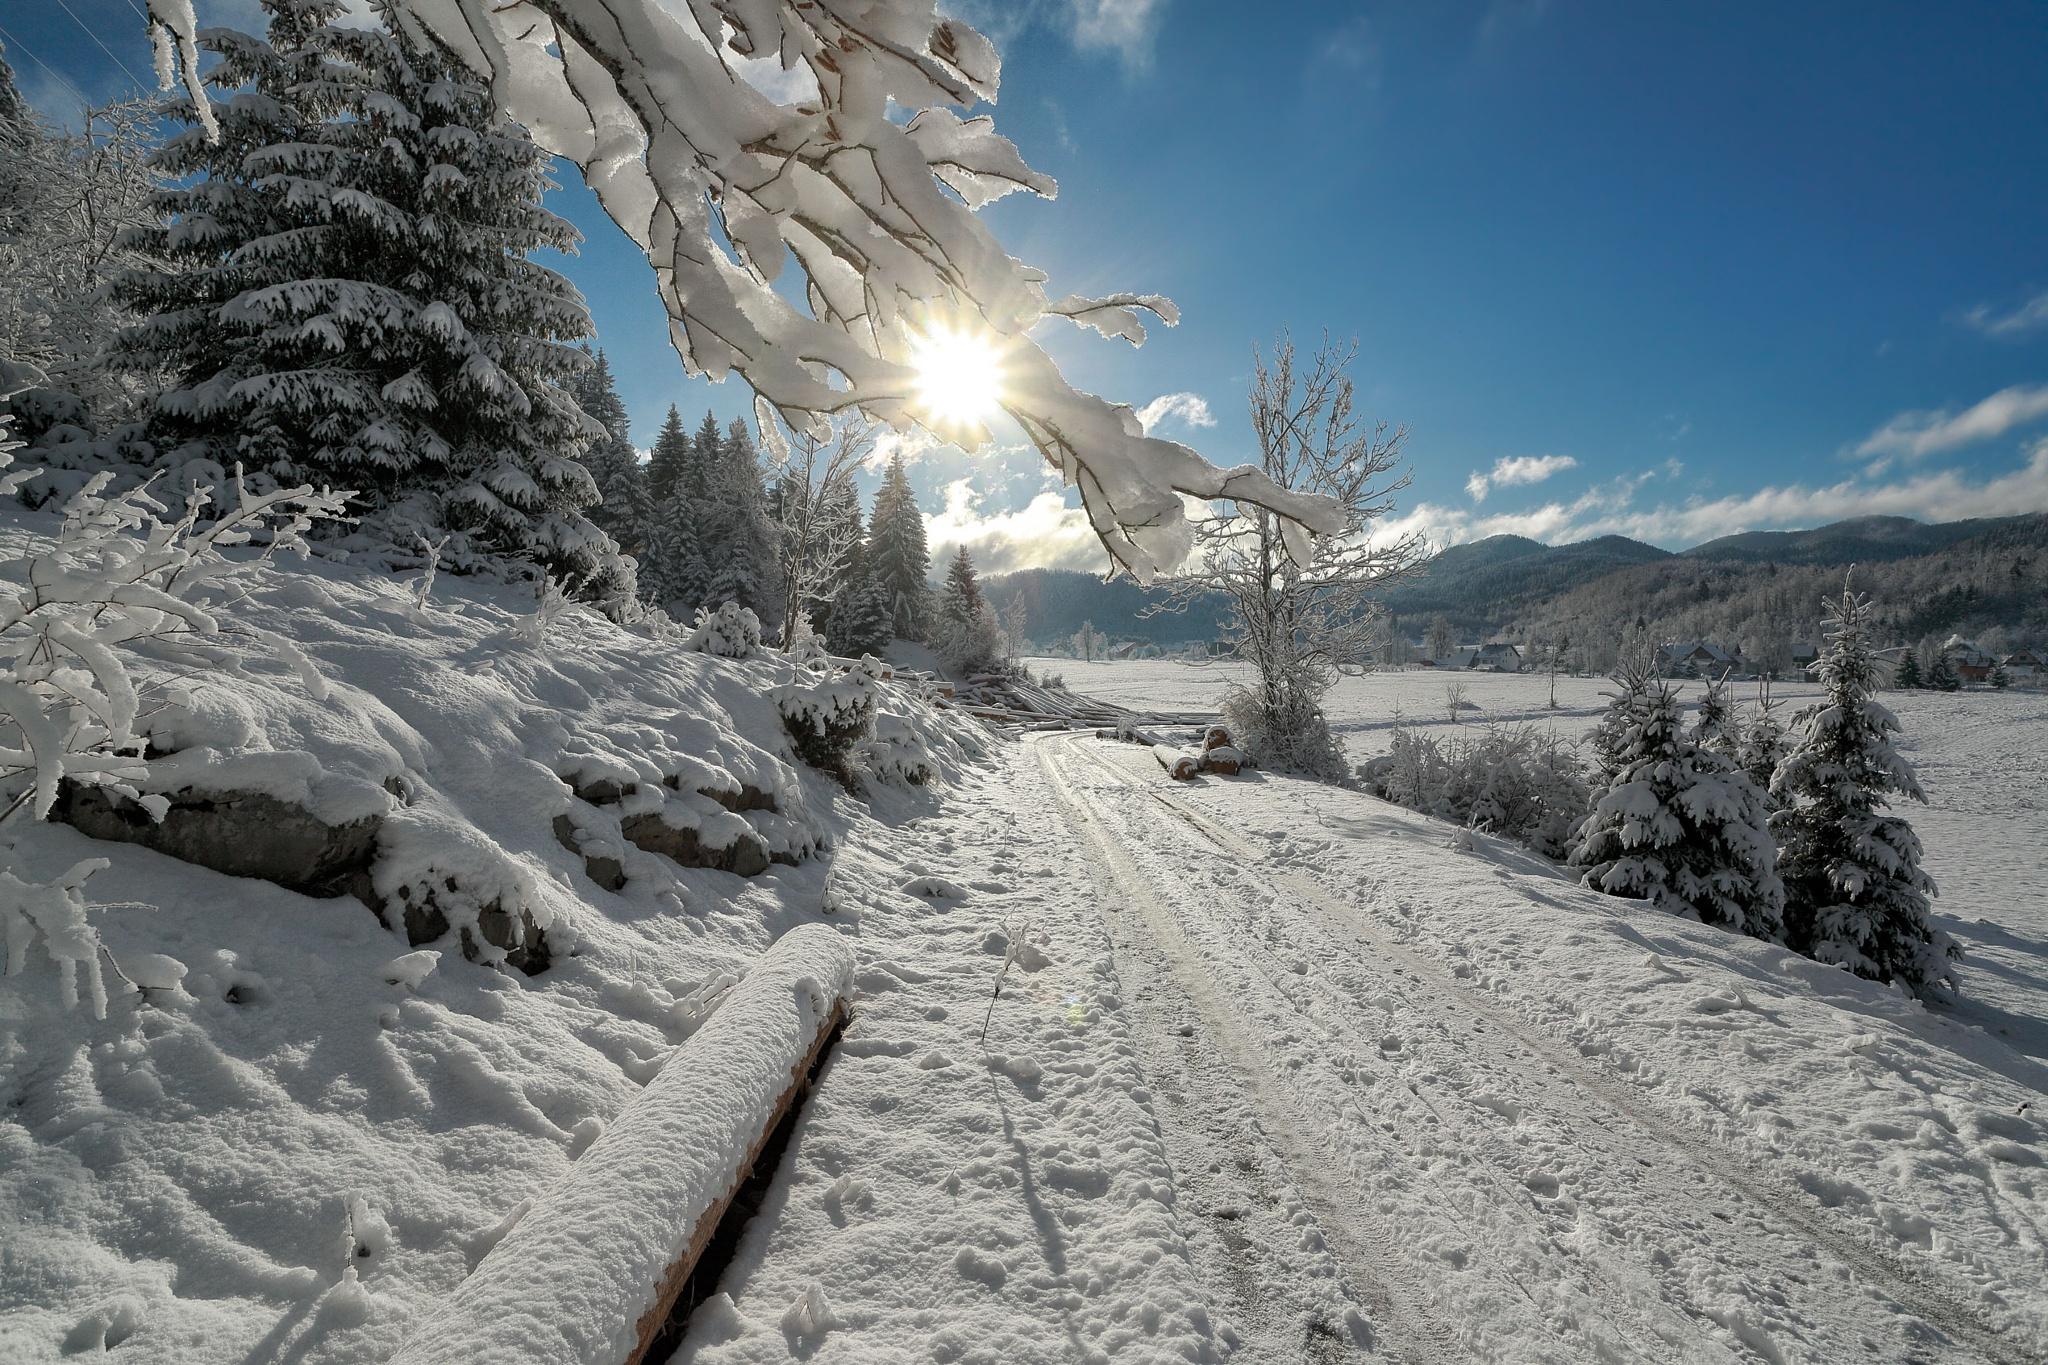 Forest road by stanislav.horacek2